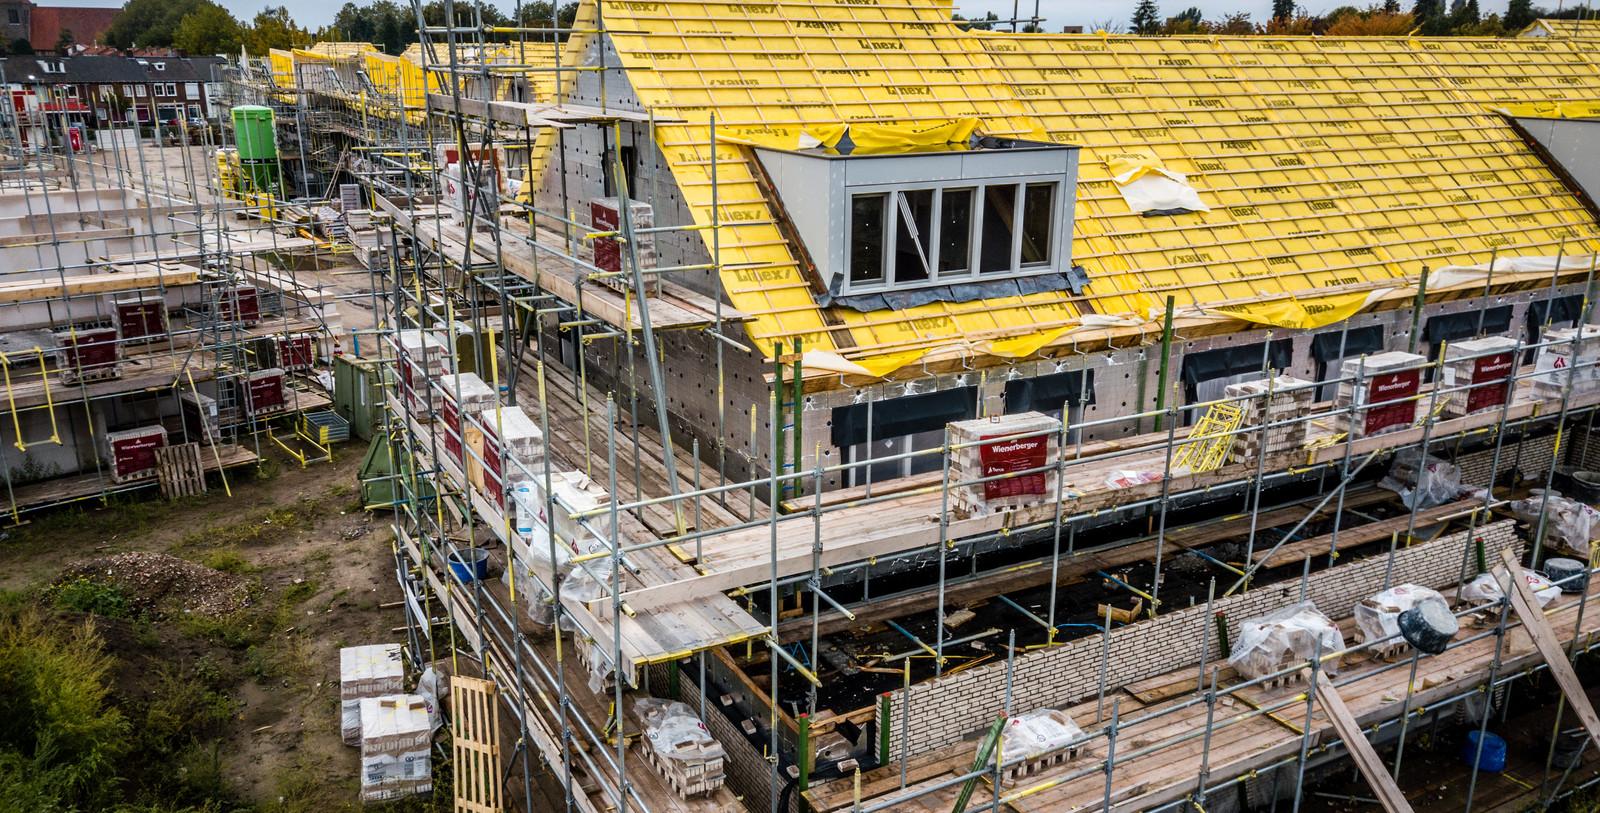 De stikstofcrisis legt nagenoeg alle bouwprojecten stil.